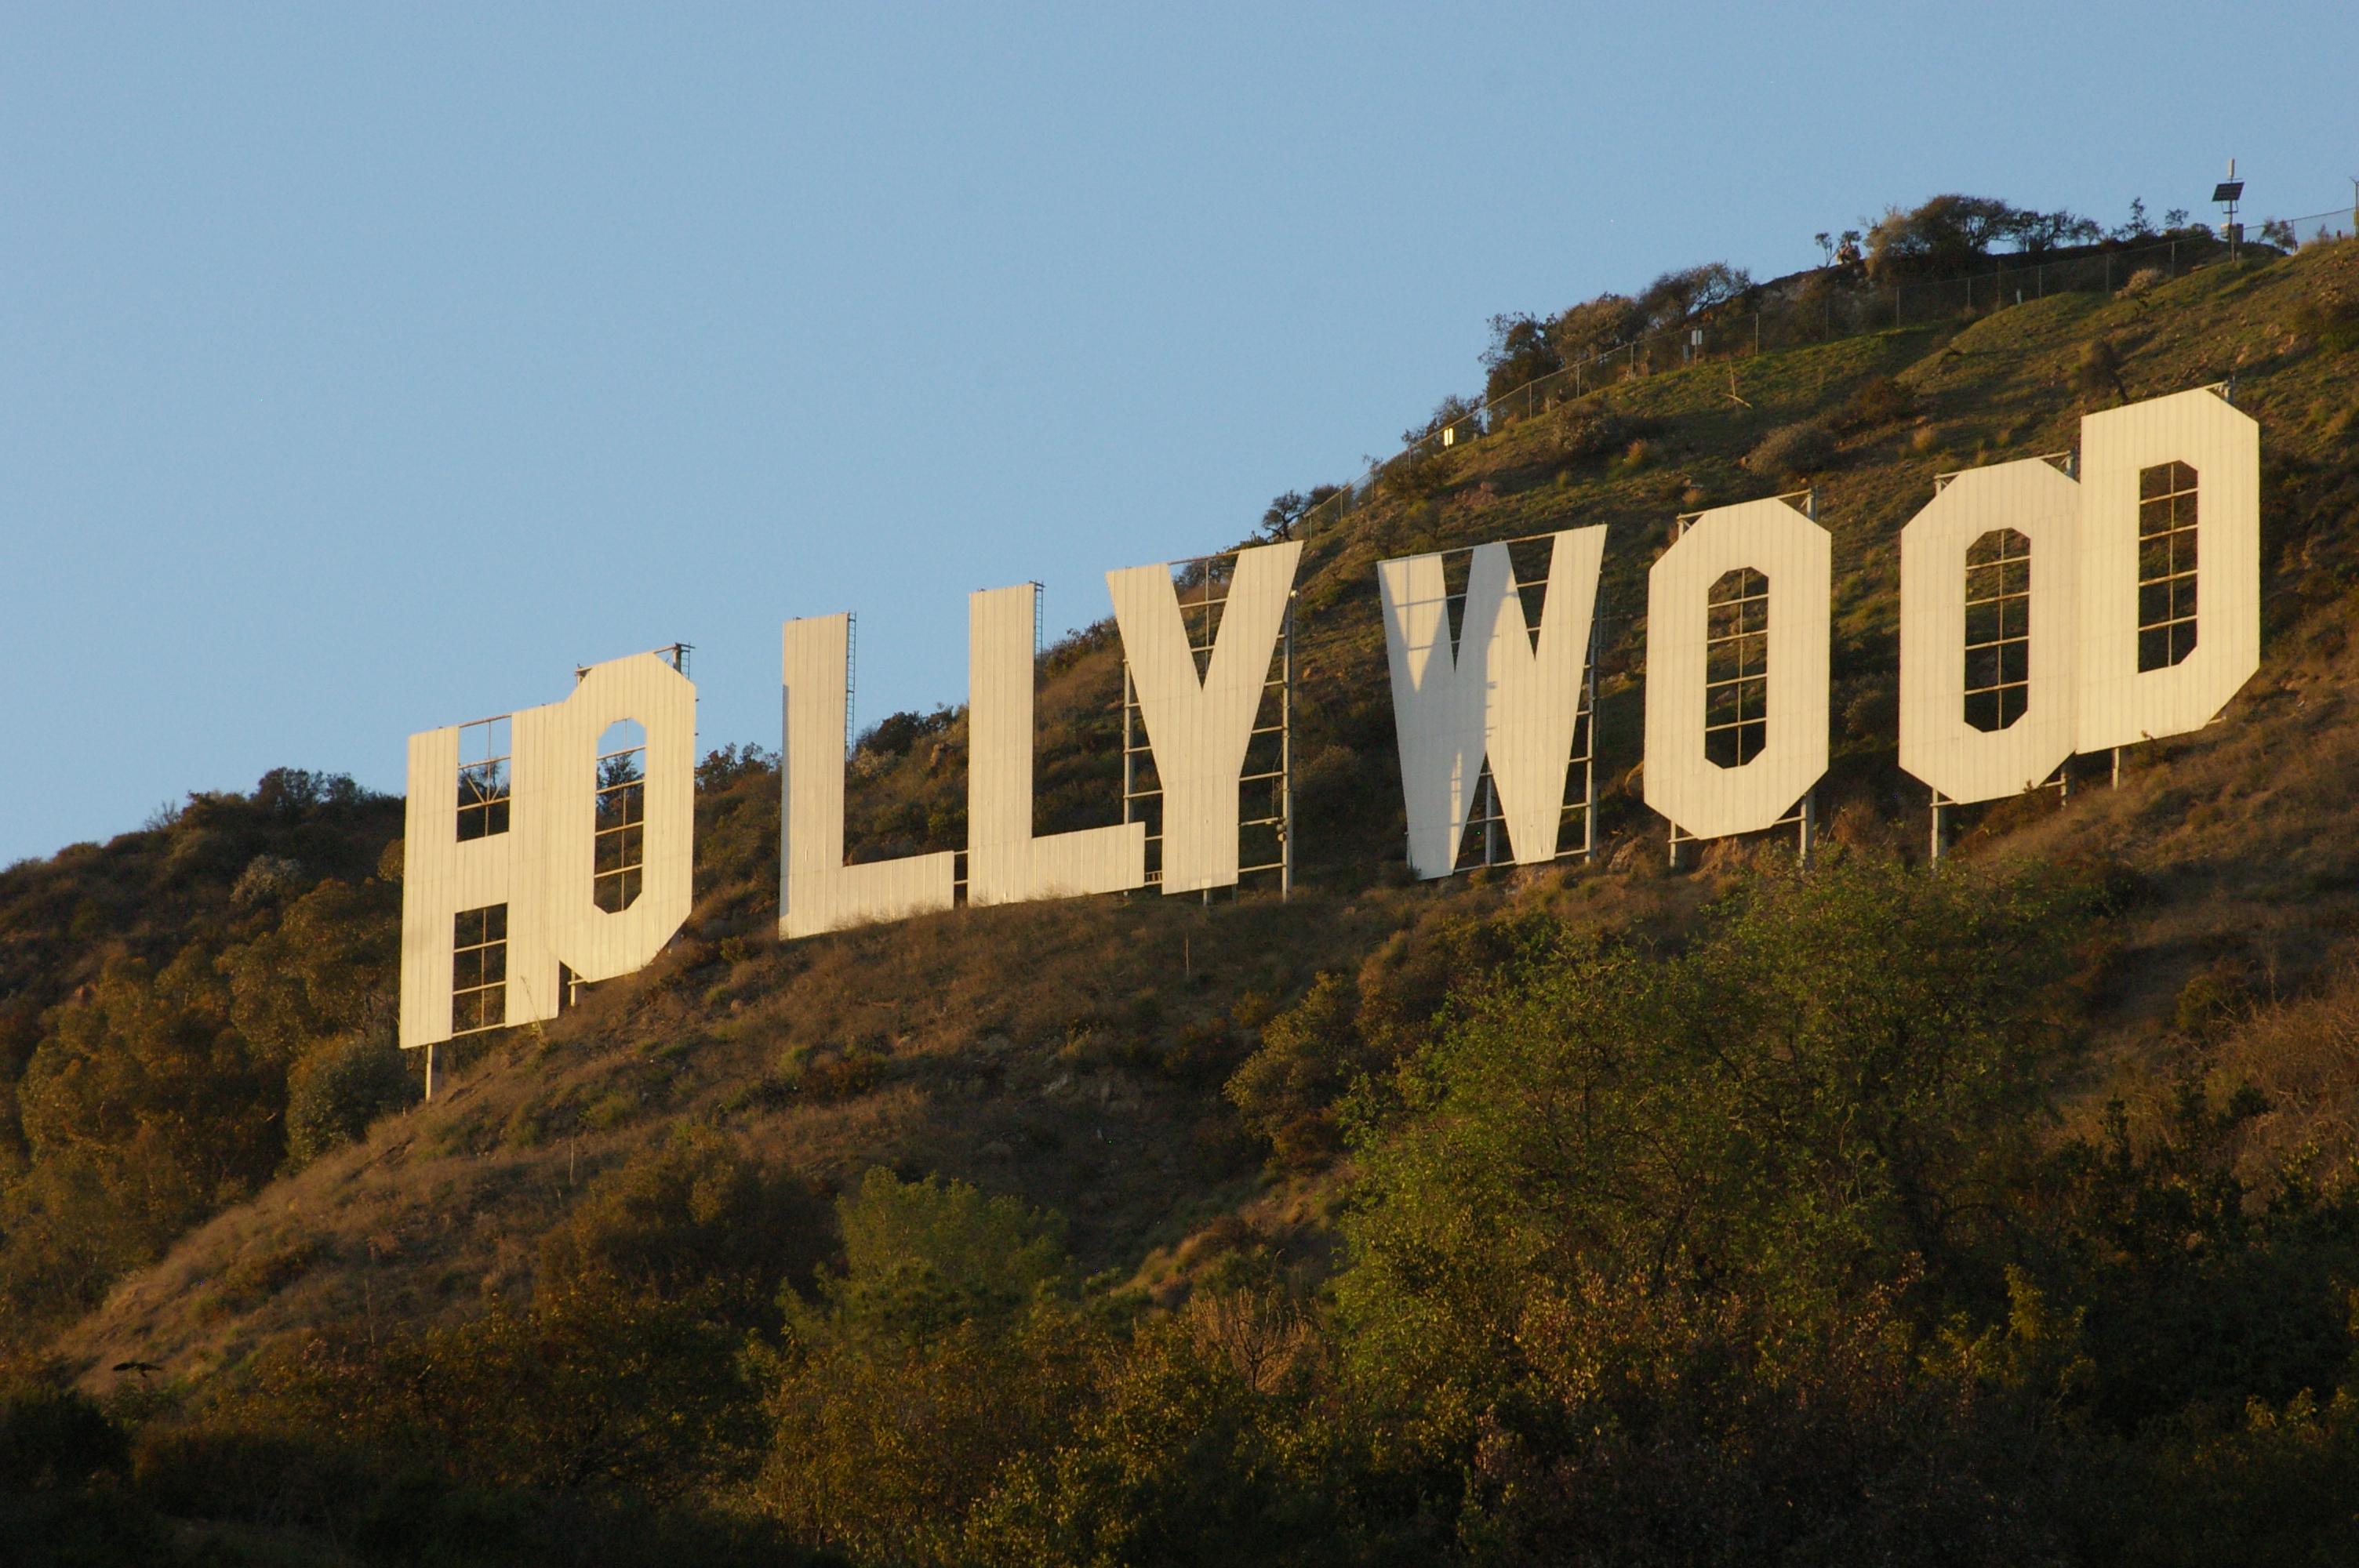 Hollywood. Photo: Wikimedia